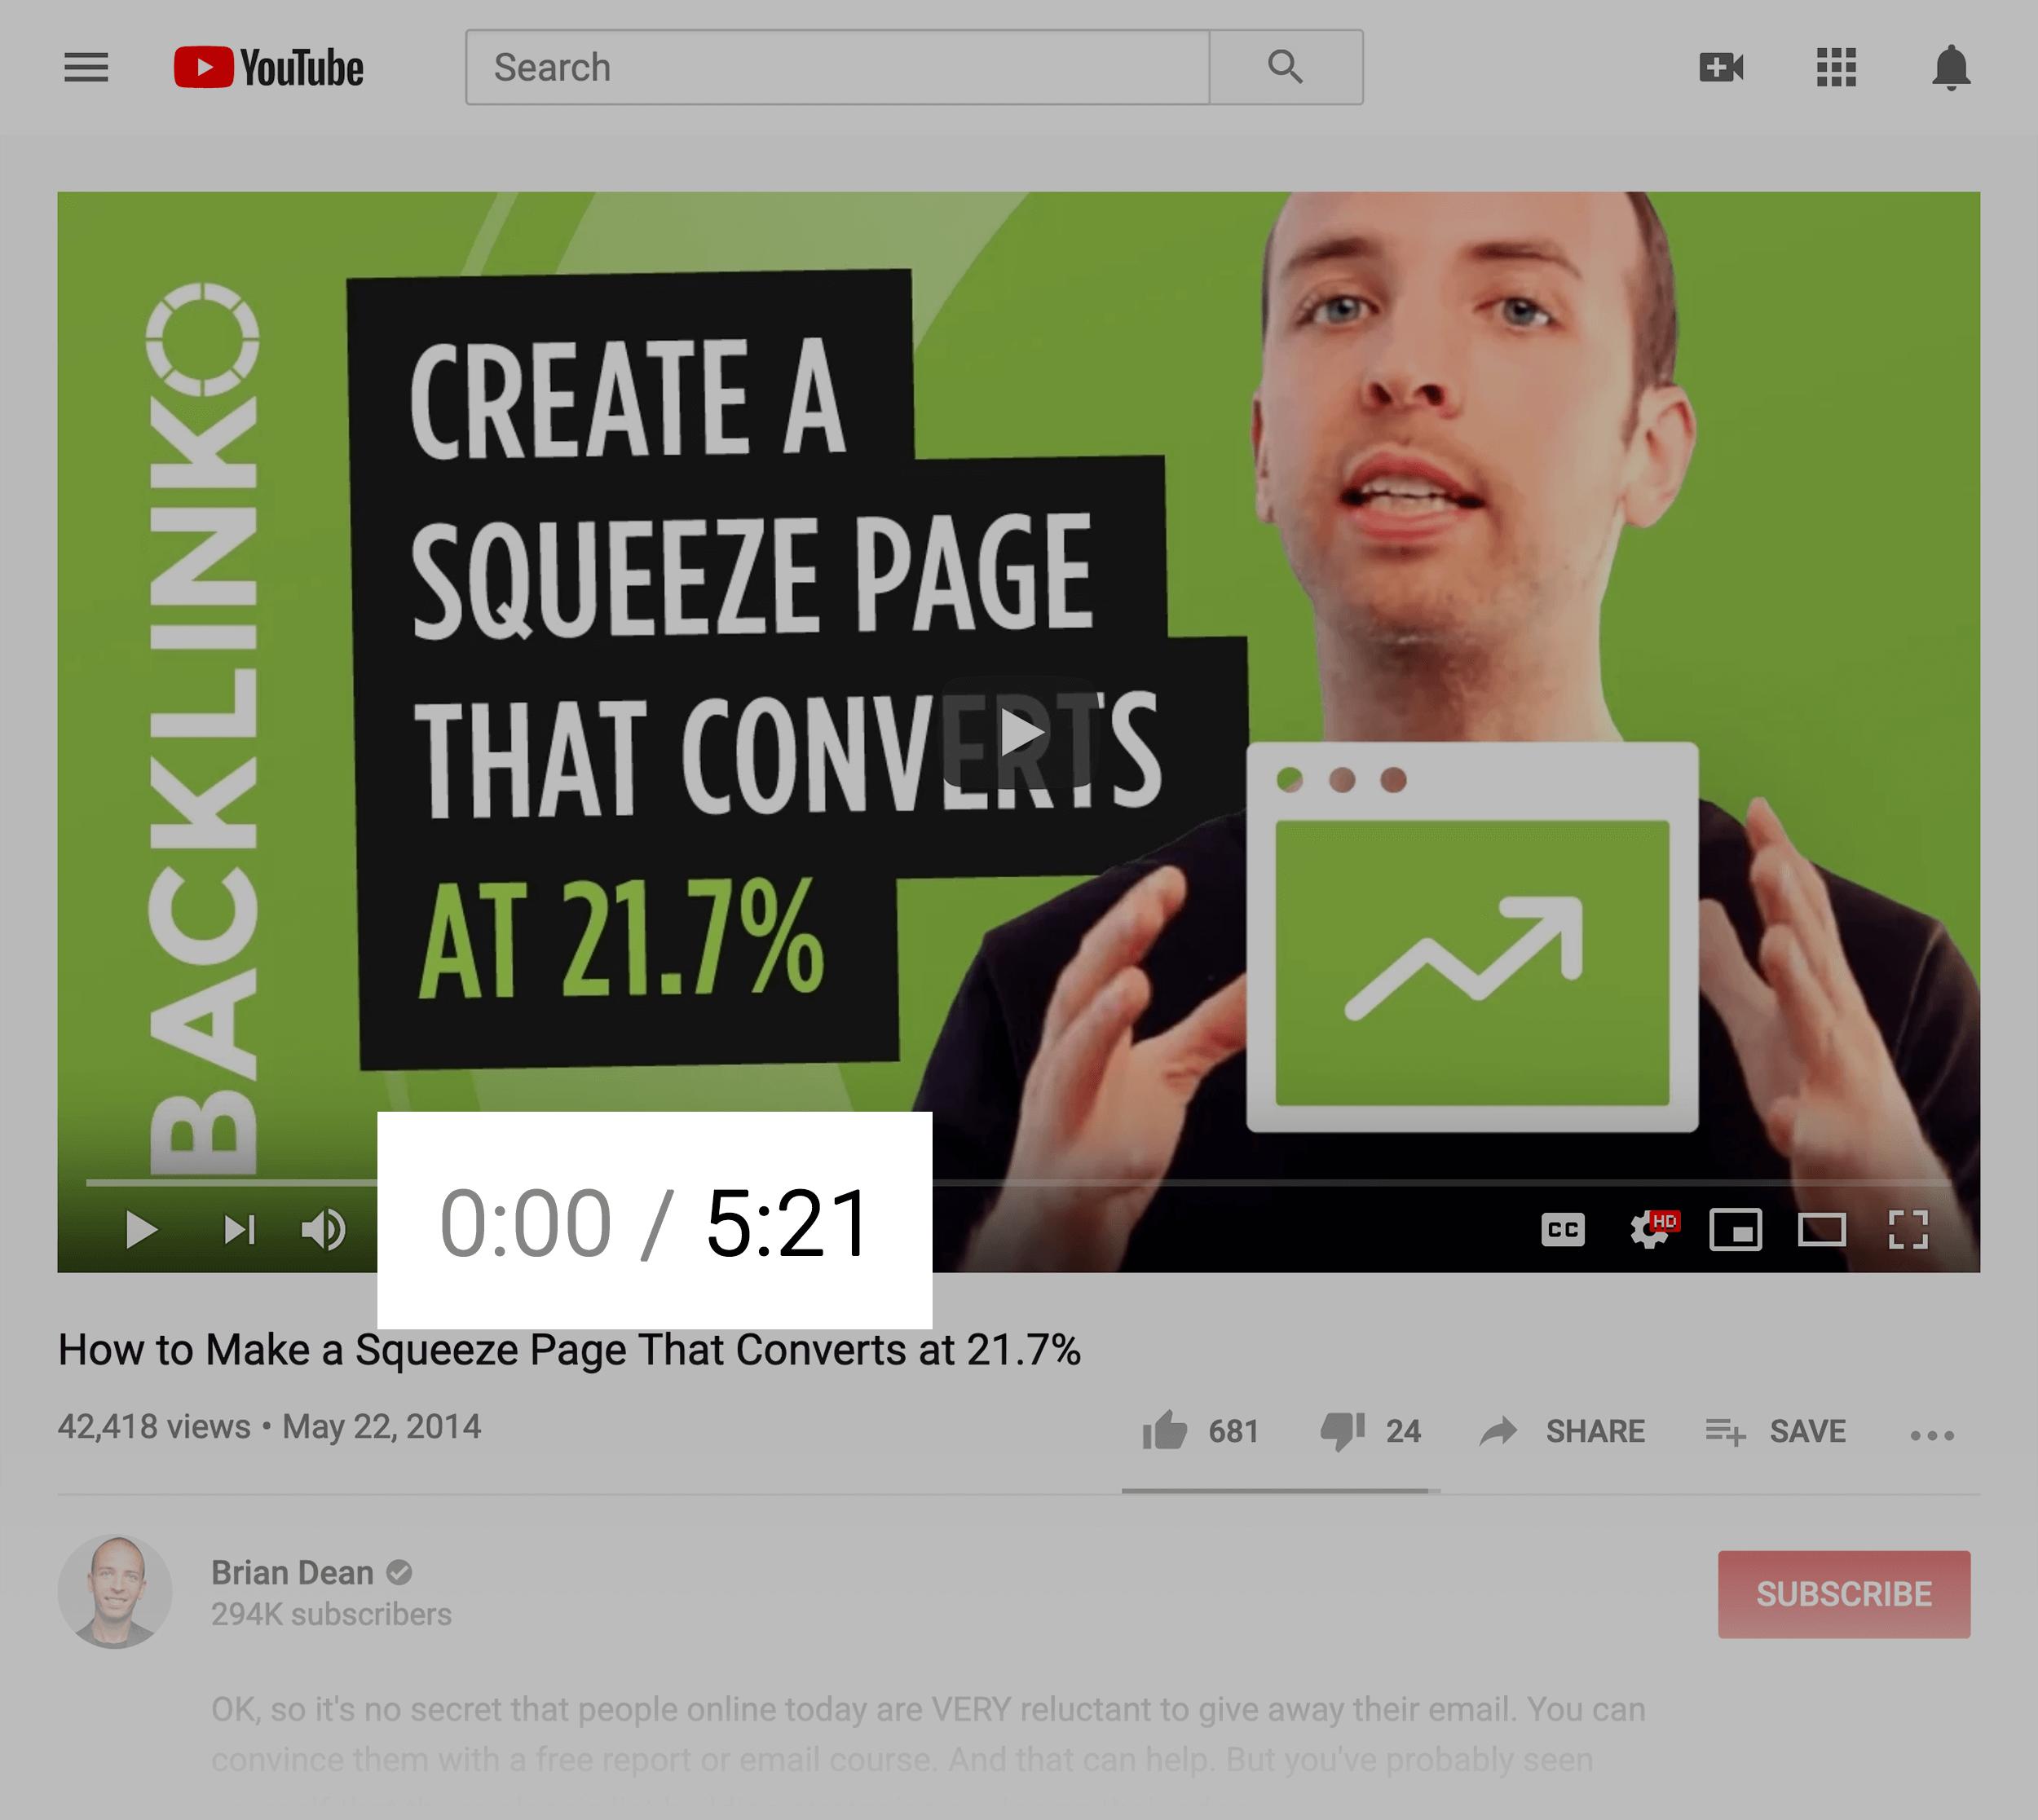 Short video example